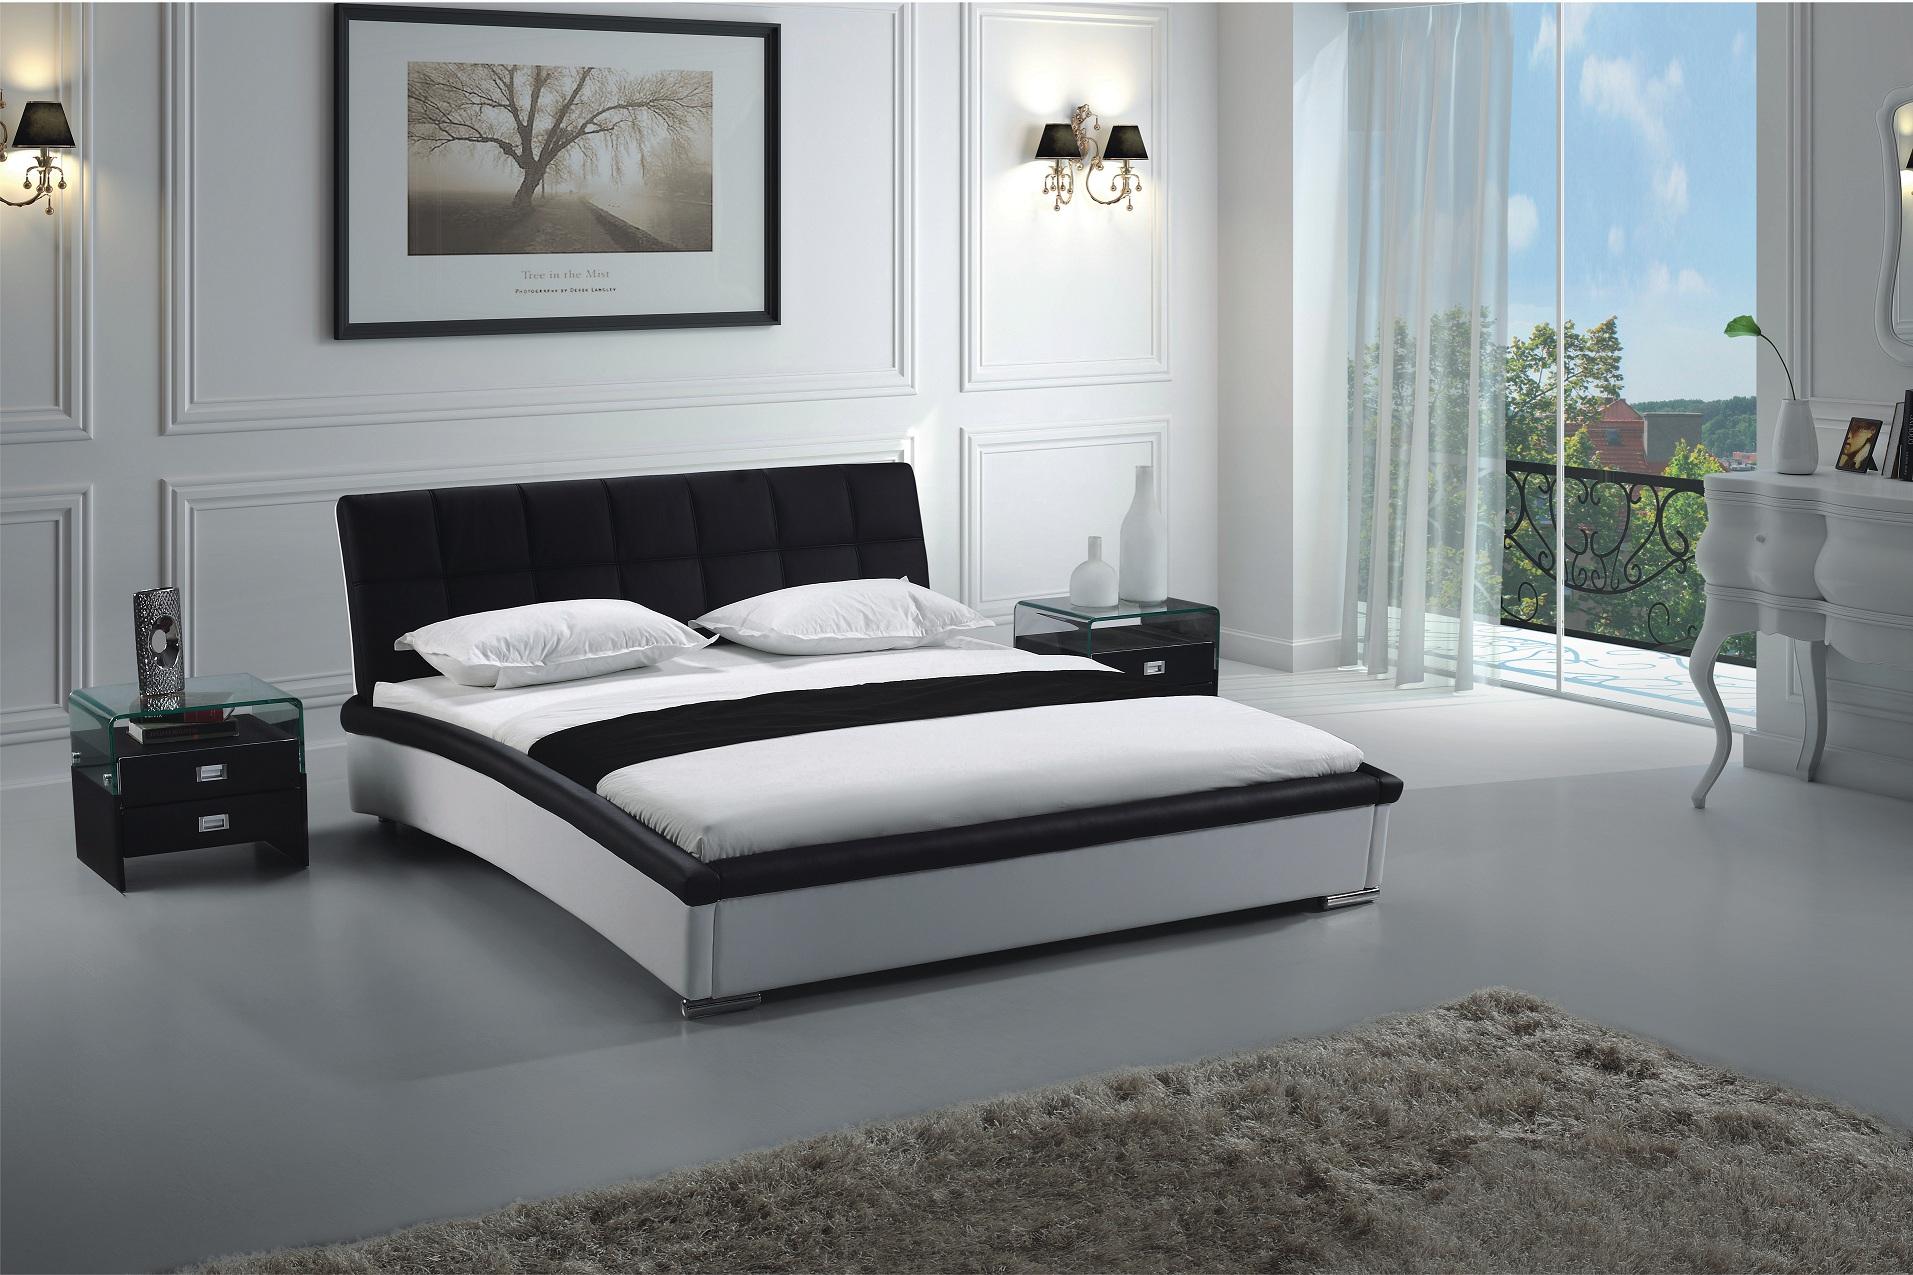 schlafzimmer betten lederbetten b2b trade. Black Bedroom Furniture Sets. Home Design Ideas